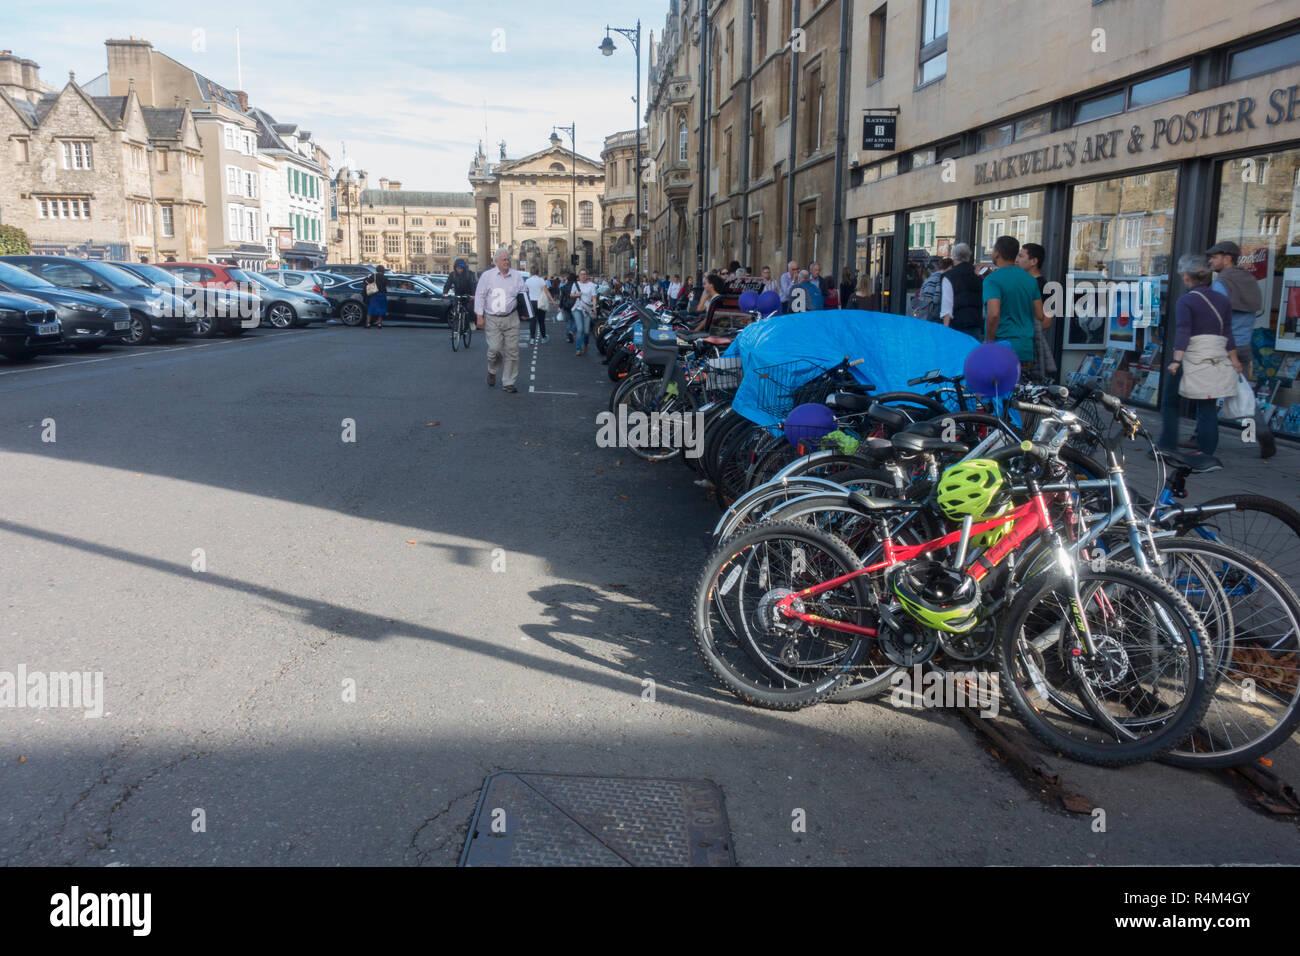 Oxford city centre, England - Stock Image